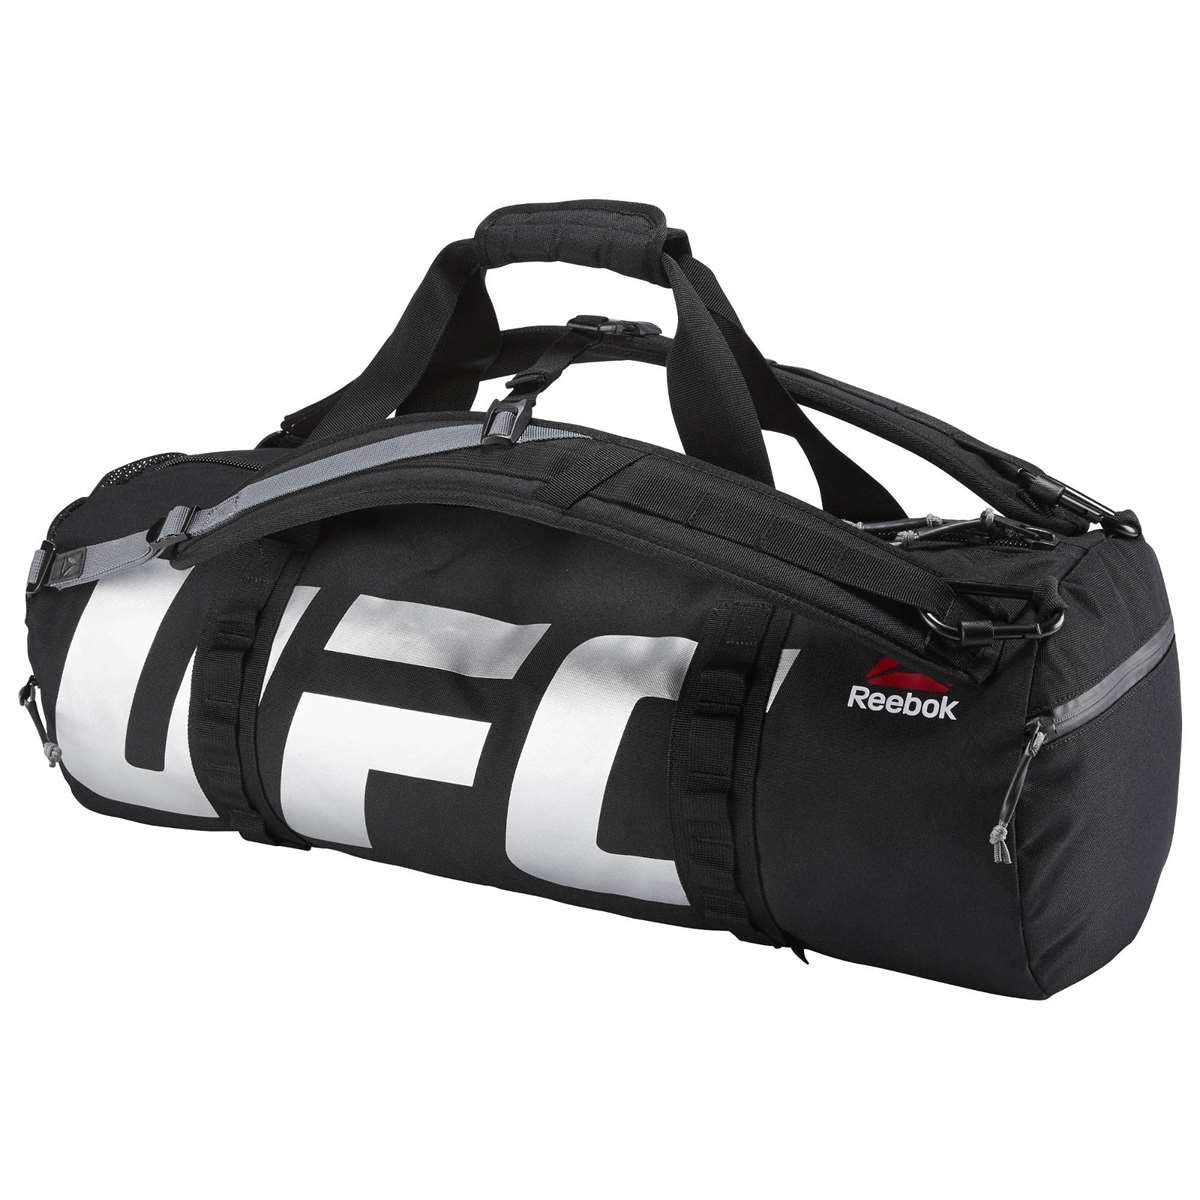 Reebok UFC Convertible Grip Duffle Bag